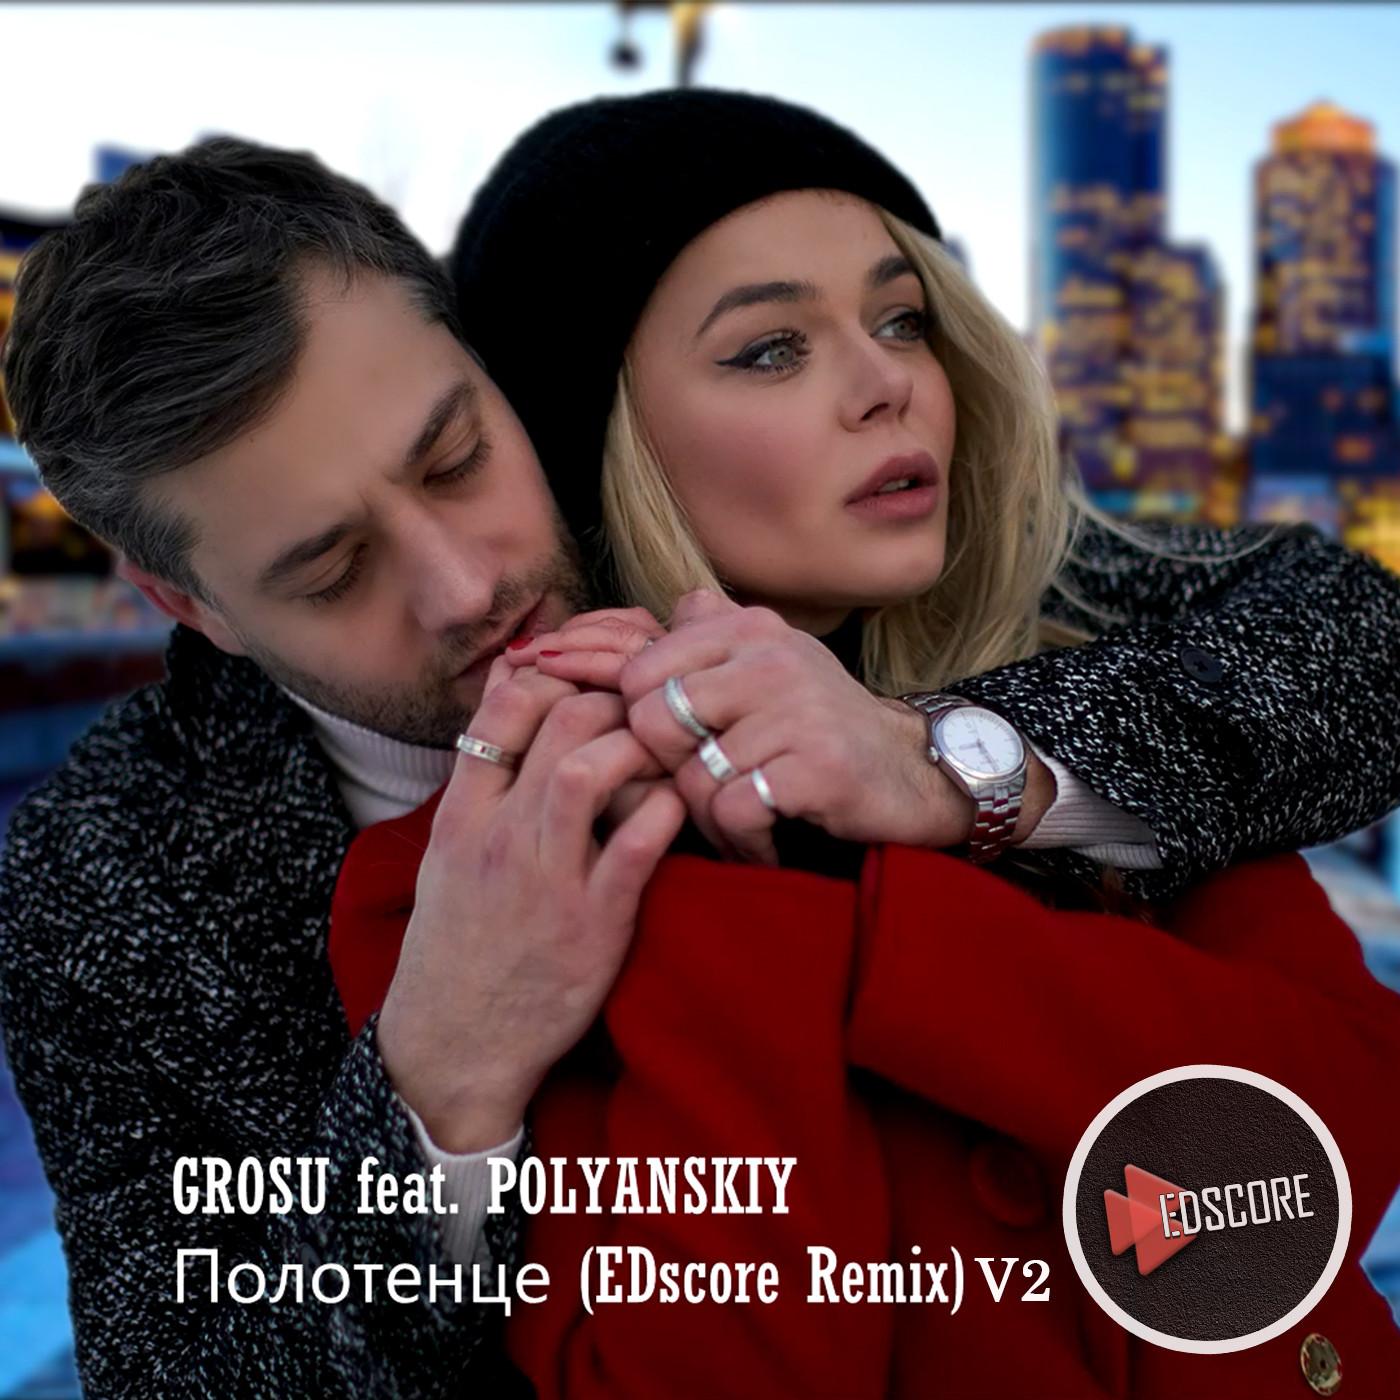 GROSU feat. POLYANSKIY — Полотенце (EDscore Remix) V2